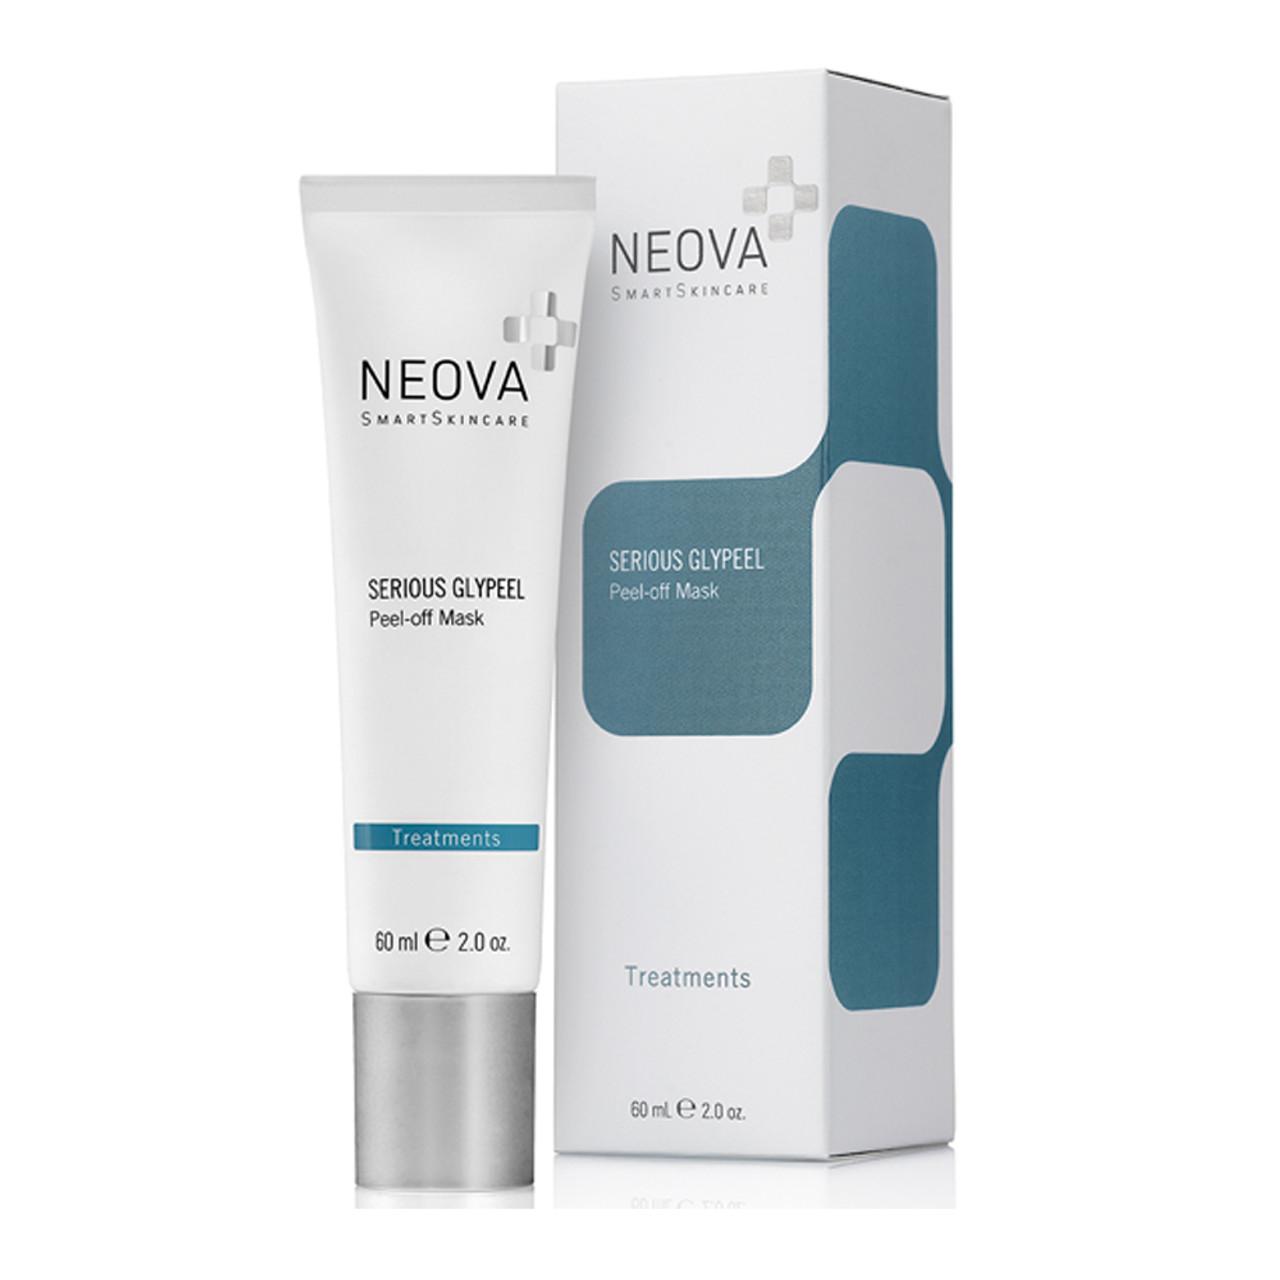 Neova Serious GlyPeel Peel-Off Mask